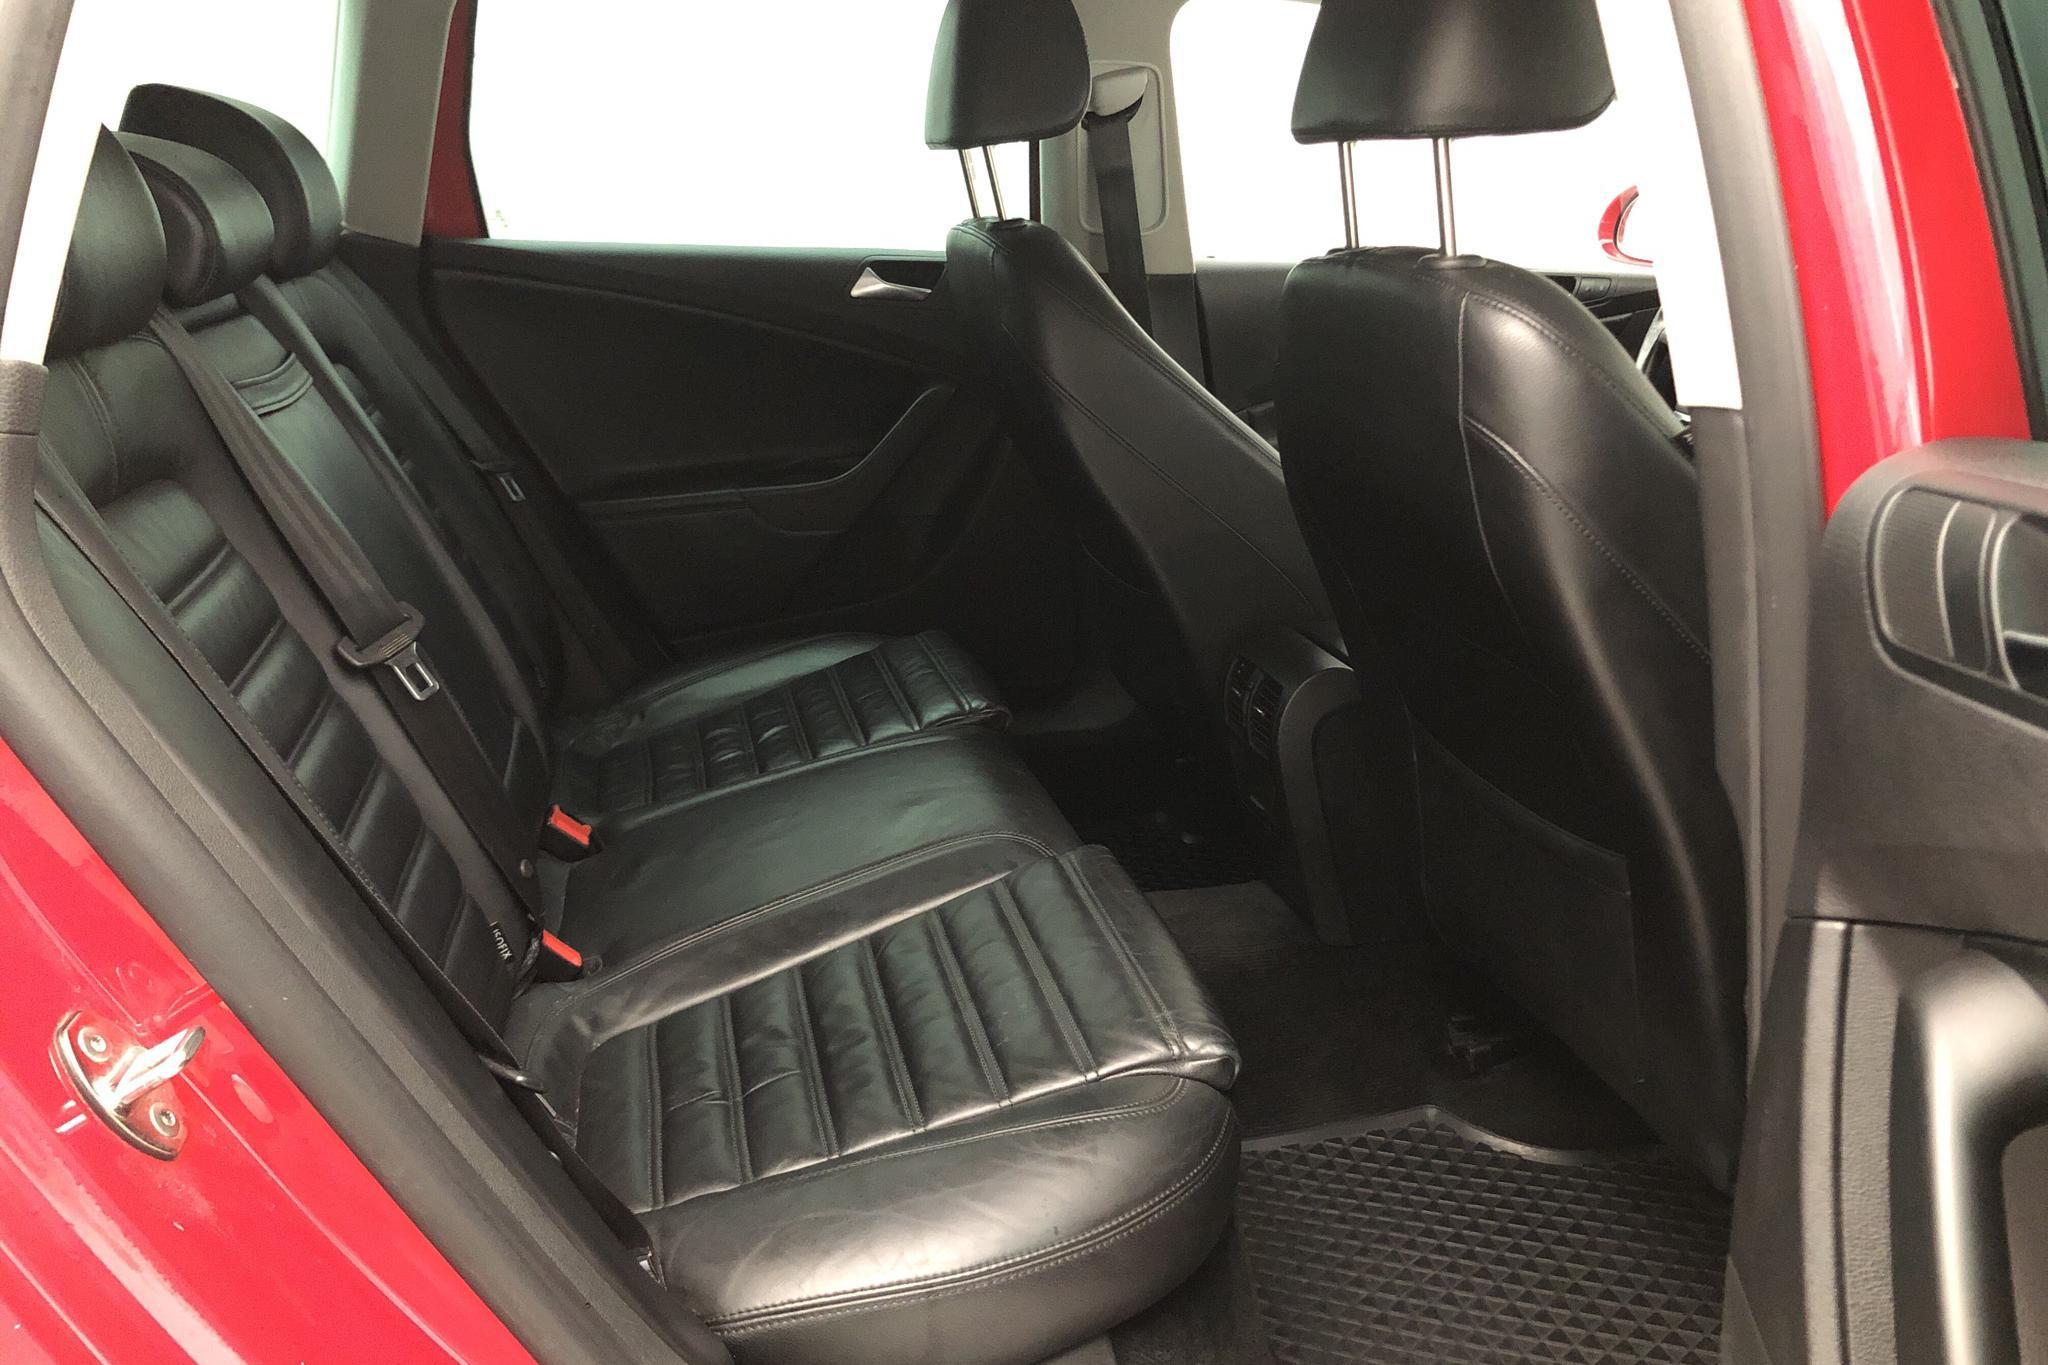 VW Passat 2.0 TDI 4-Motion Variant (170hk) - 15 322 mil - Automat - röd - 2010